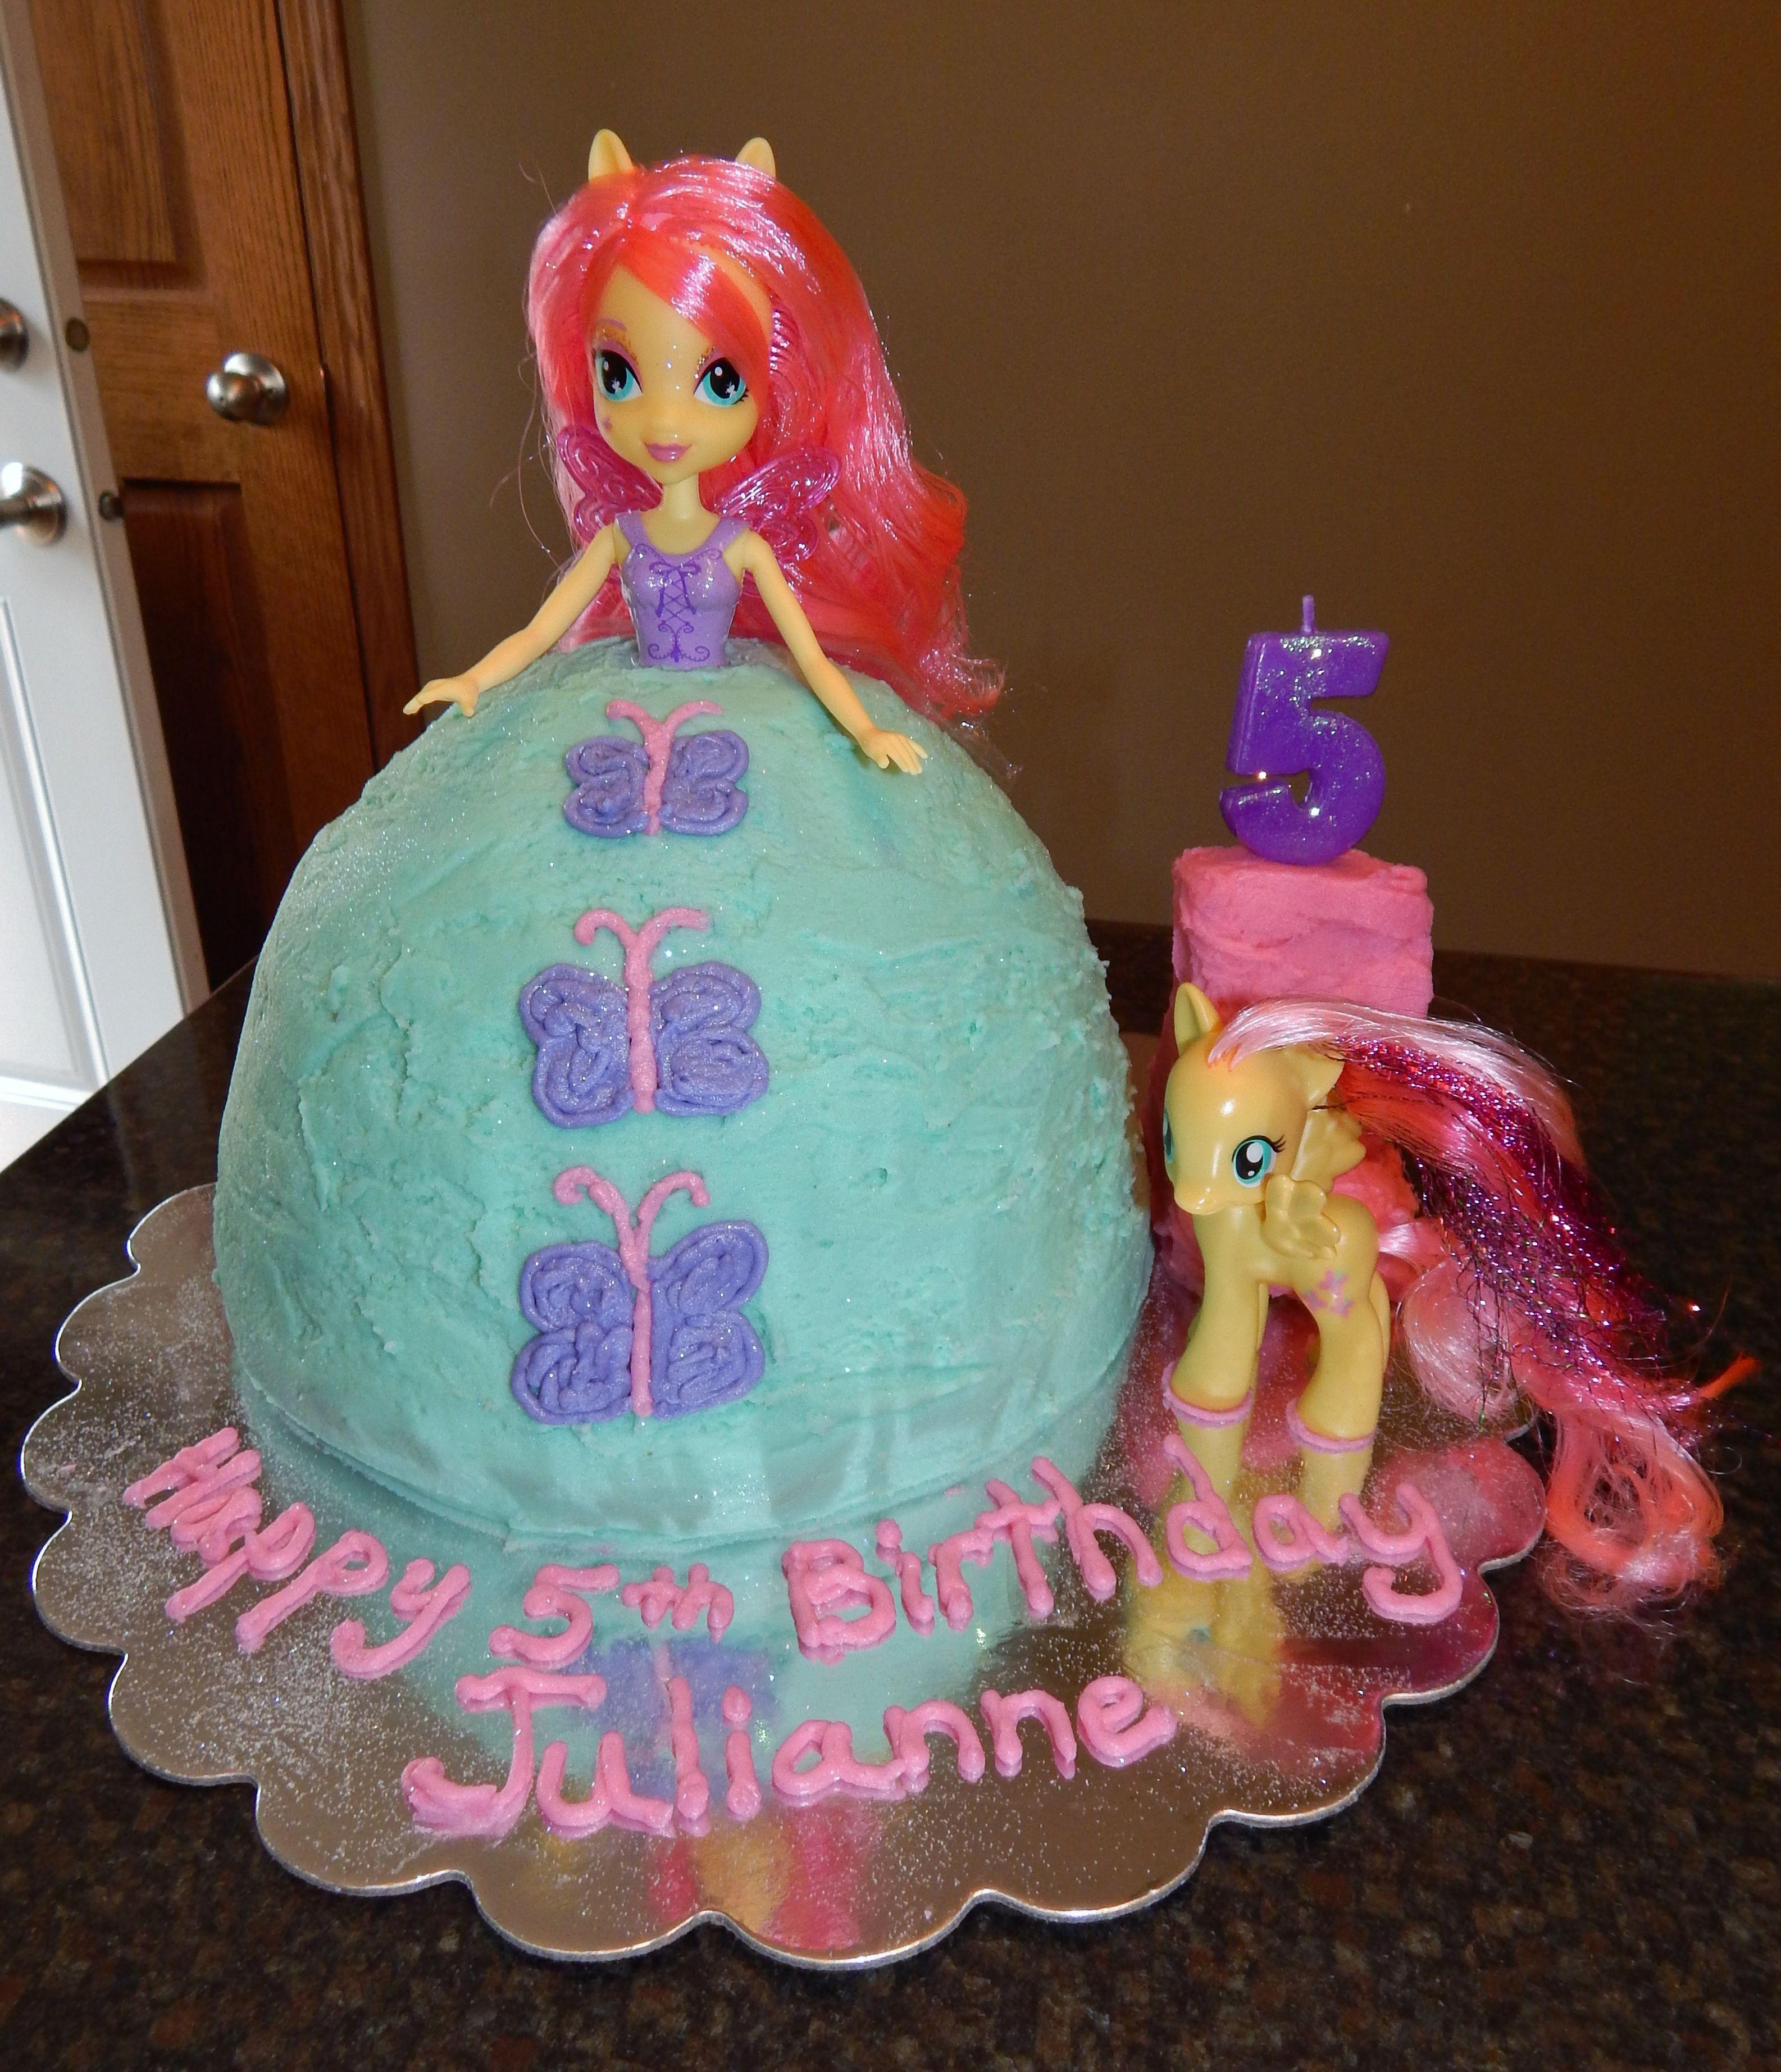 Fluttershy Equestria Girl Cake My Cakes Pinterest Girl cakes